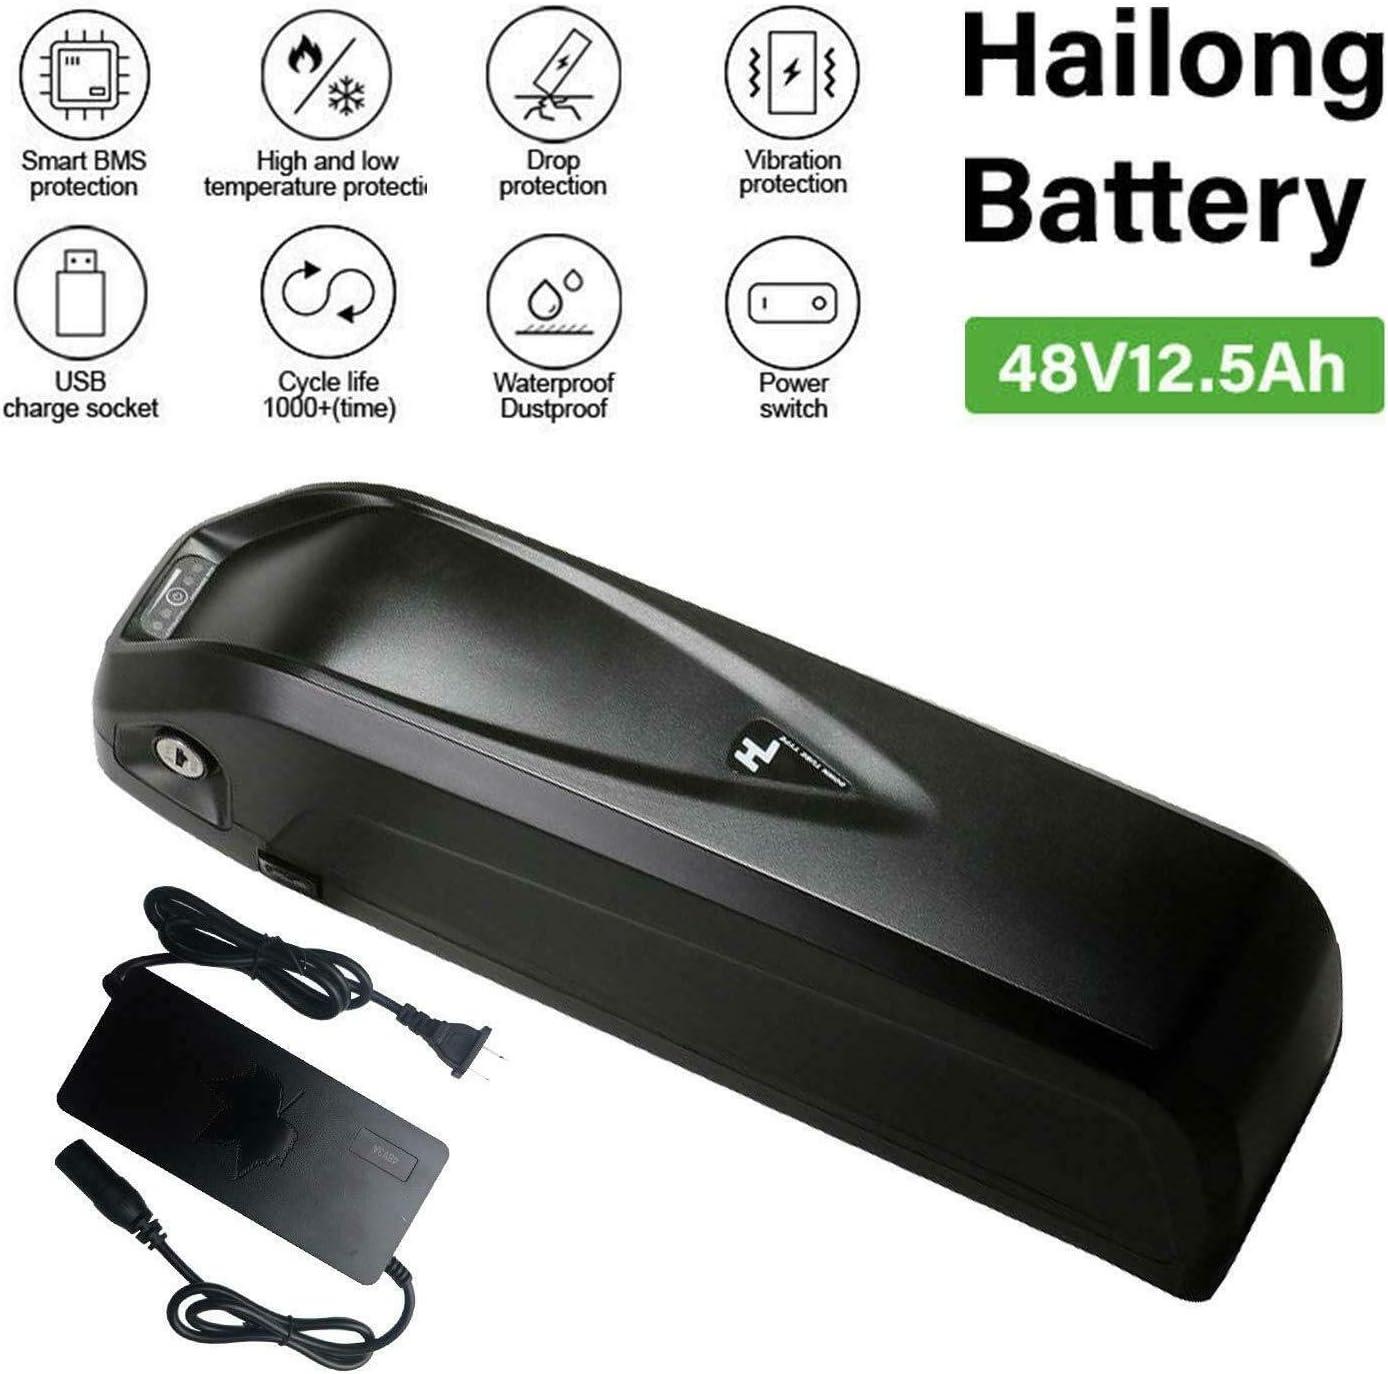 YiiYYaa 48V 12.5Ah HaiLong Ebike Battery Downtube Lithium Battery with USB Port, Electric Bike Battery for 500 750 1000W Motor